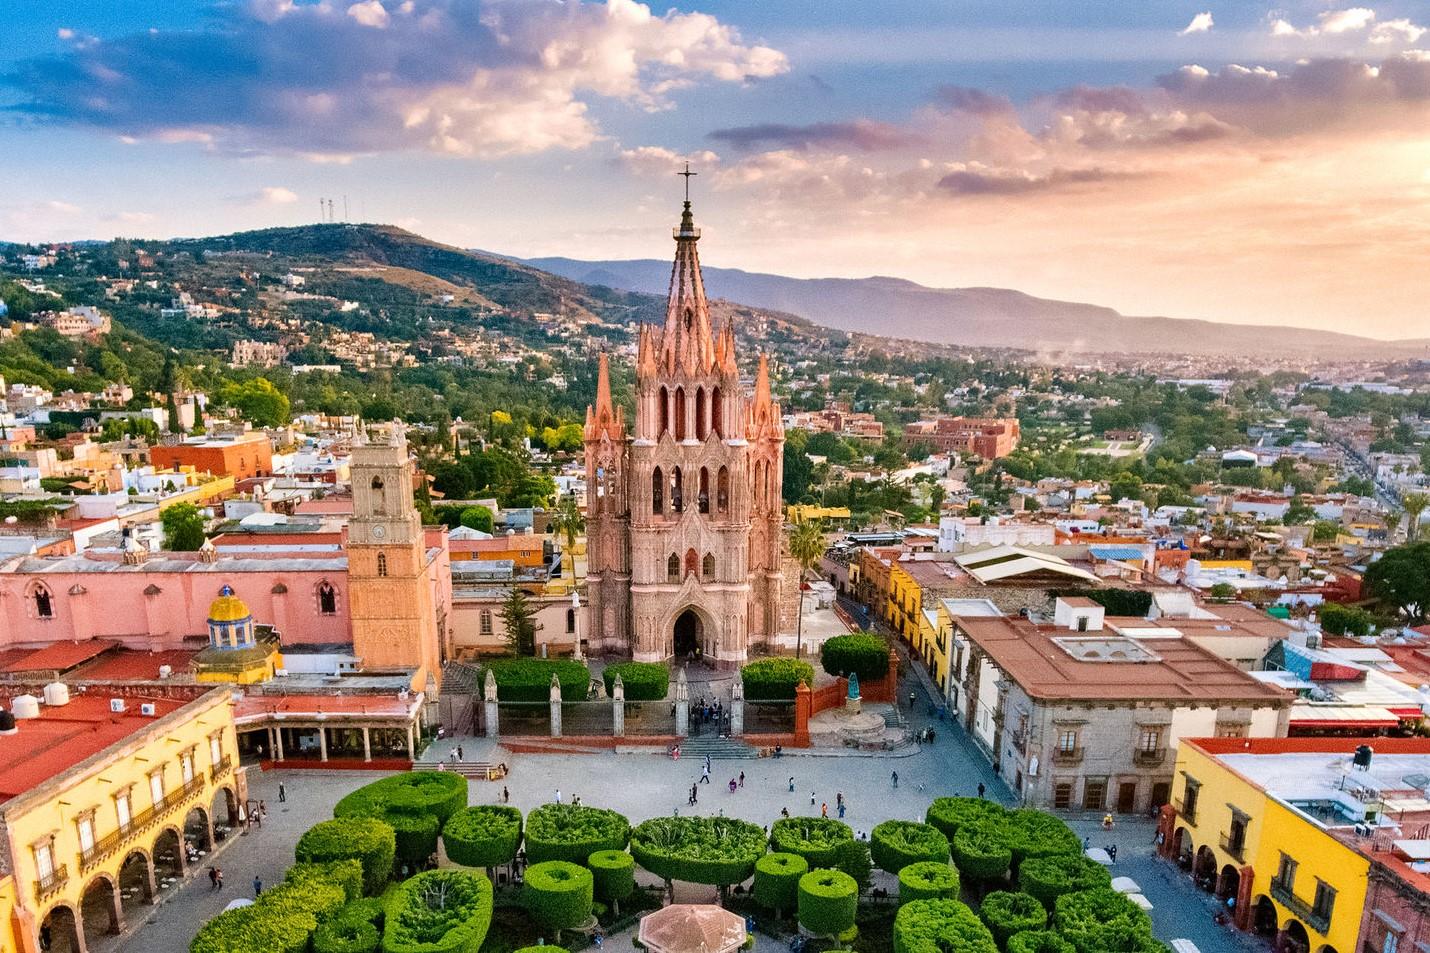 San Miguel de Allende - Parroquia